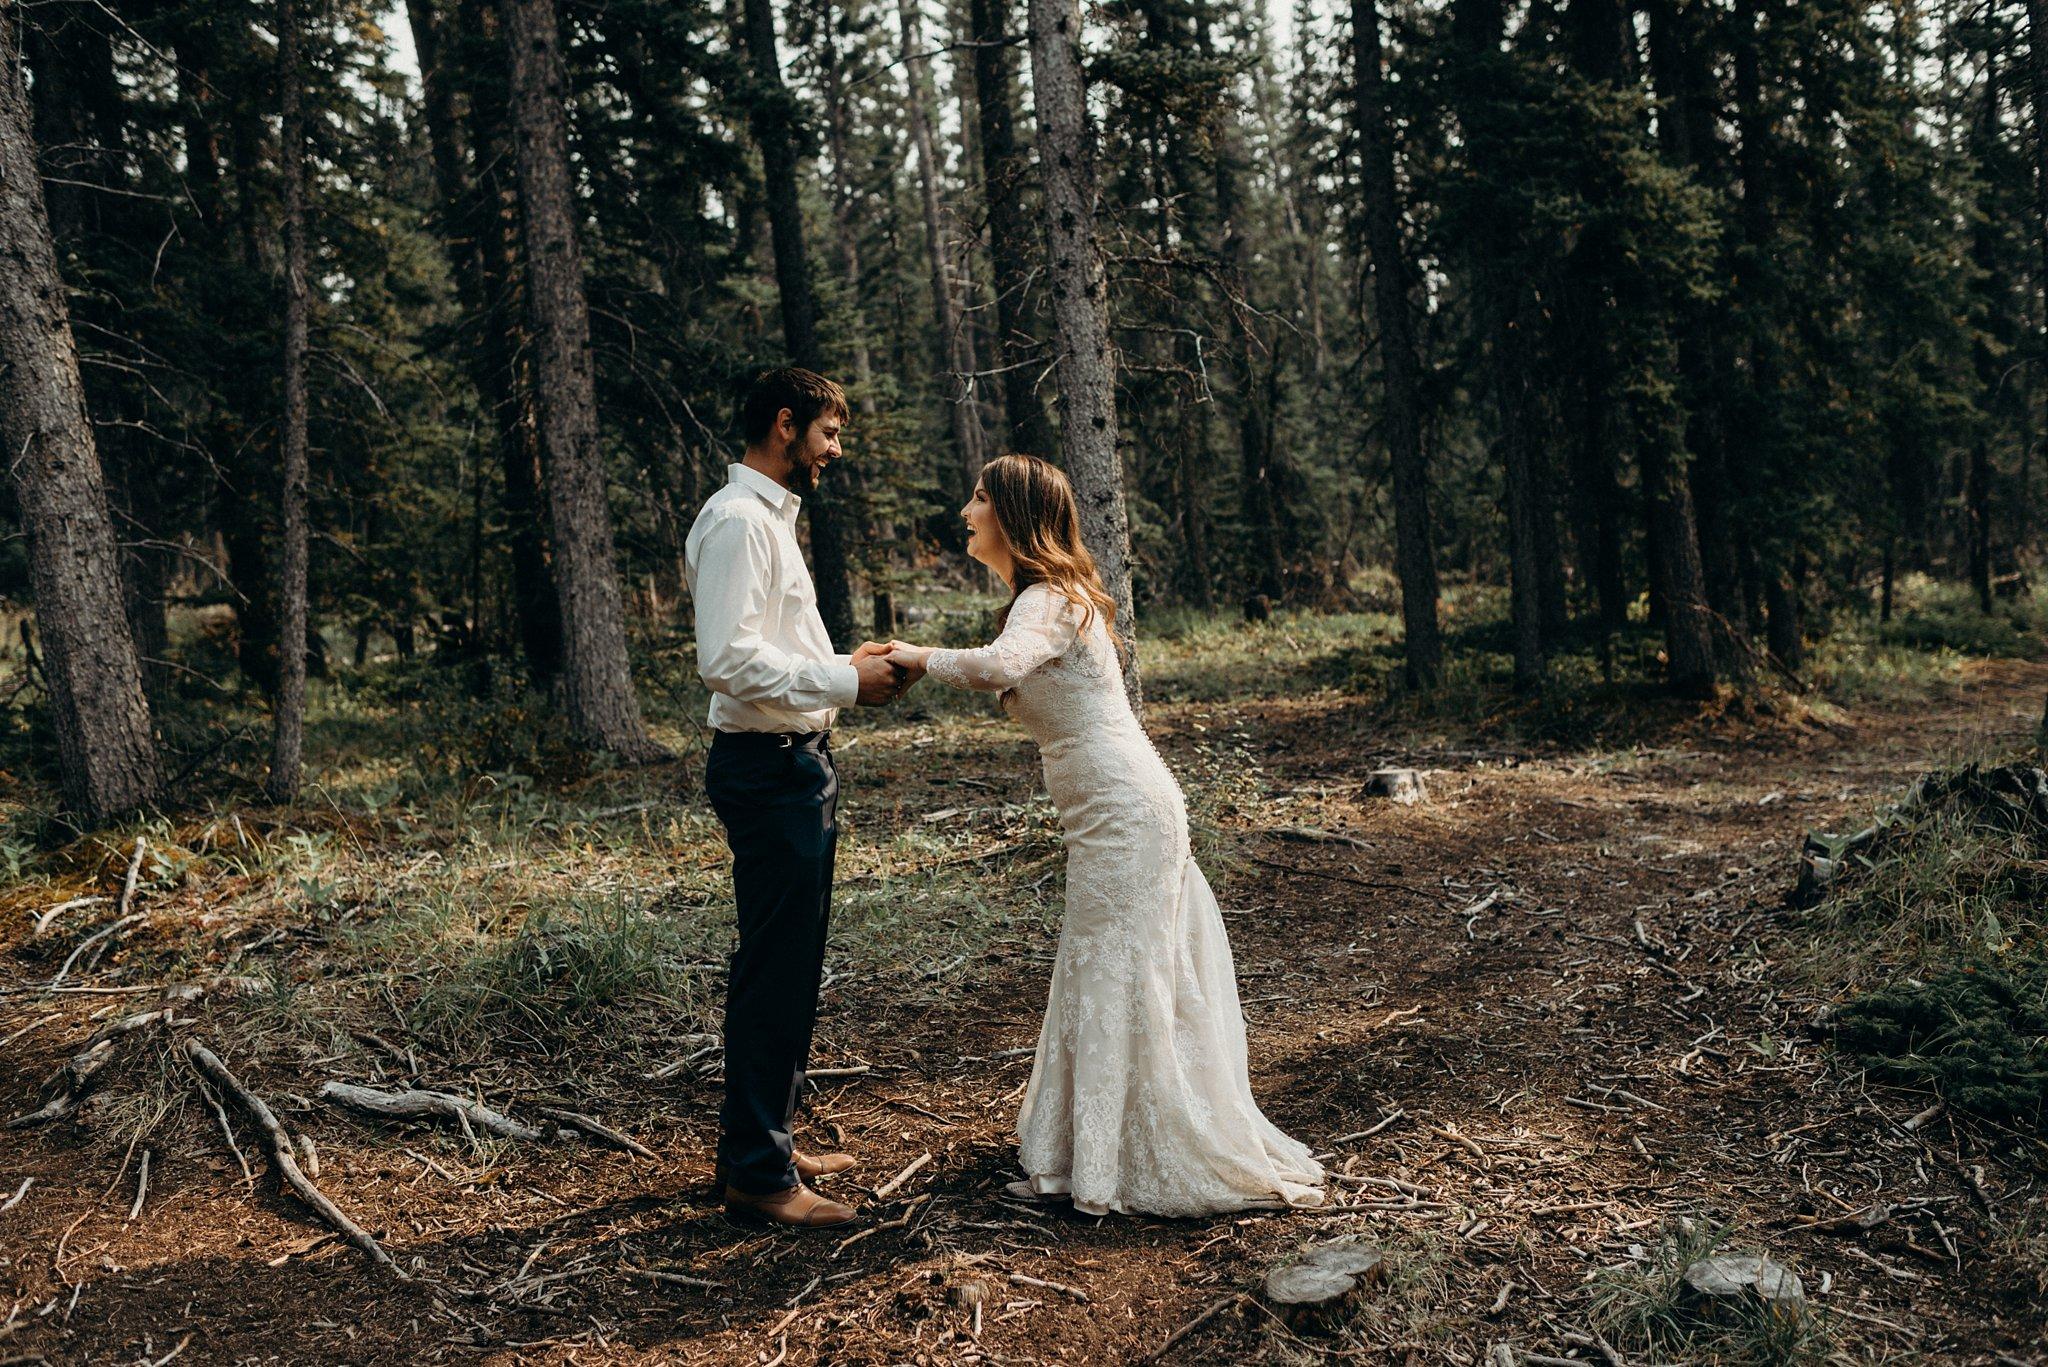 kaihla_tonai_intimate_wedding_elopement_photographer_6710.jpg